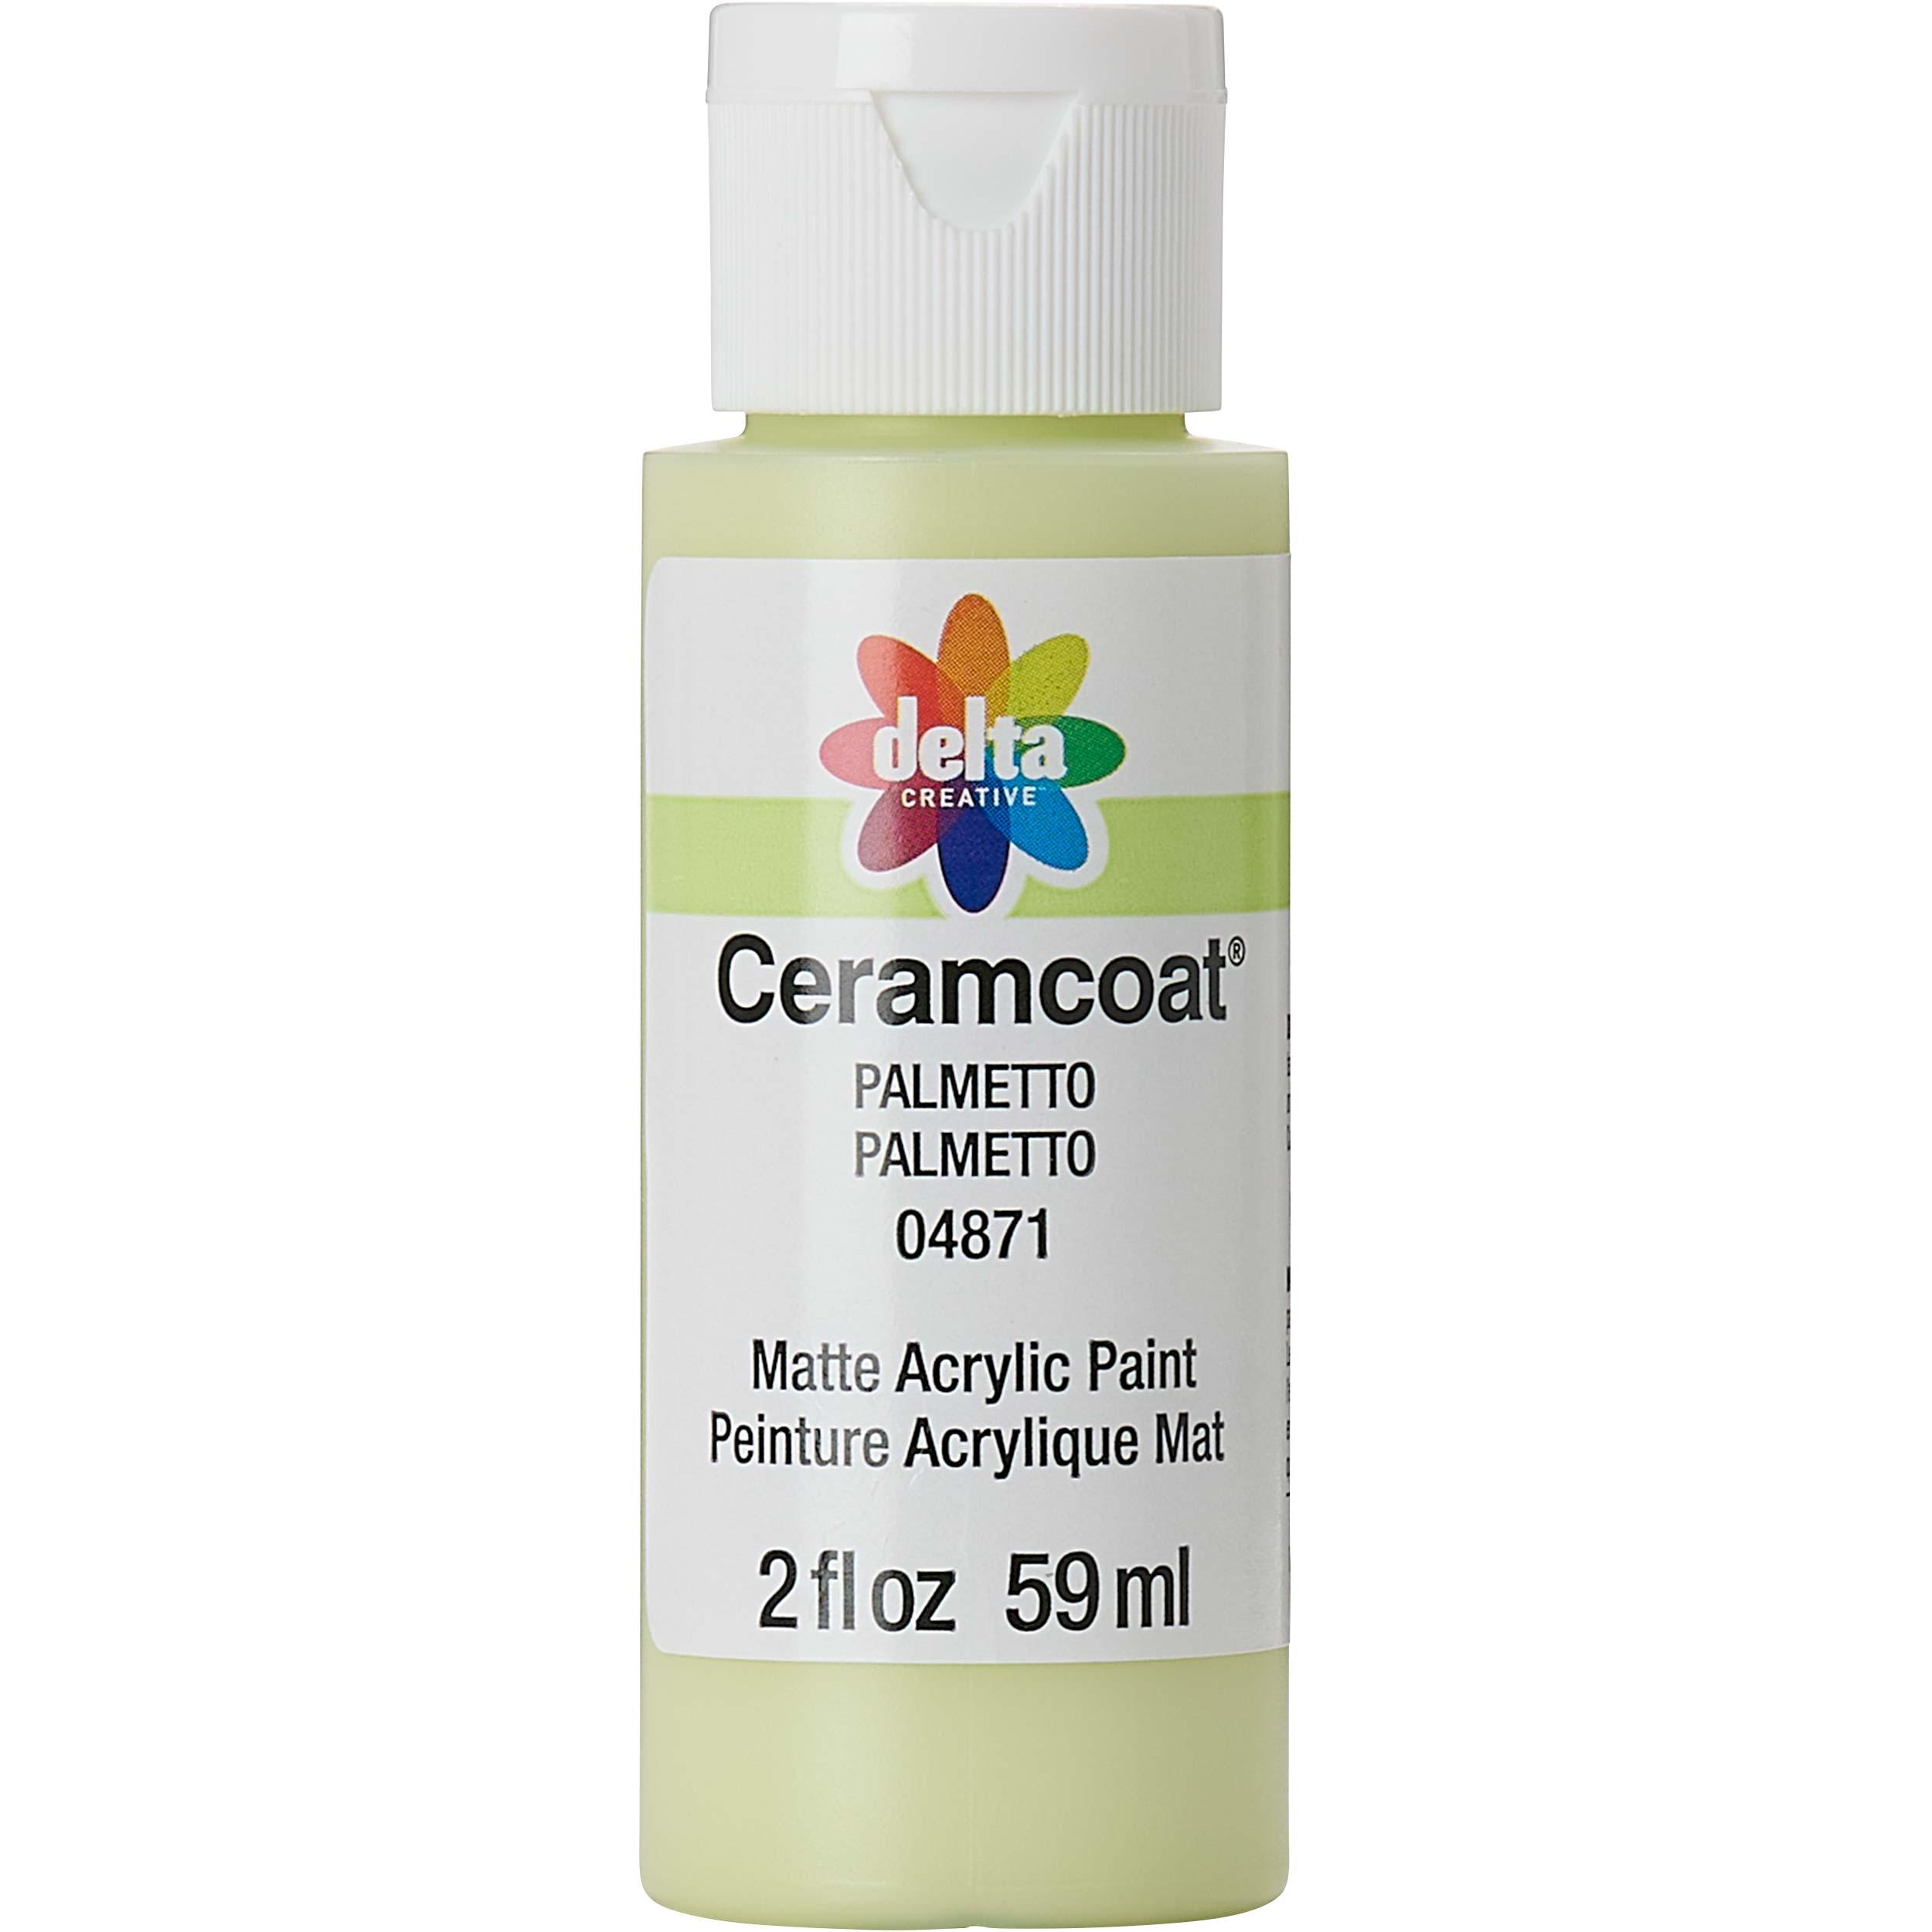 Delta Ceramcoat ® Acrylic Paint - Palmetto, 2 oz.